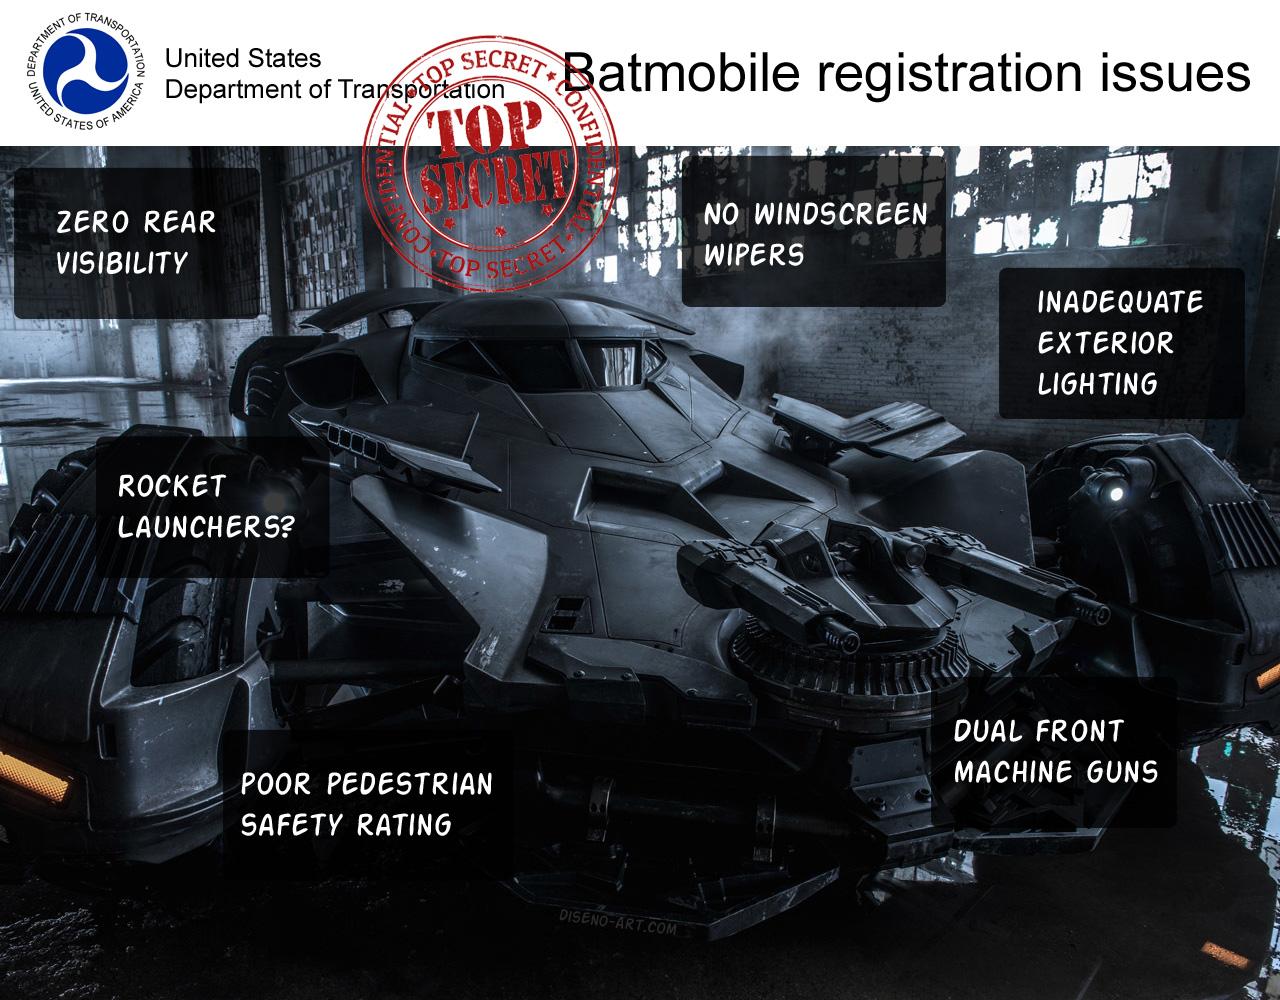 Batman v Superman's New Batmobile Is A 20-Foot Long, 7,000 Pound ...